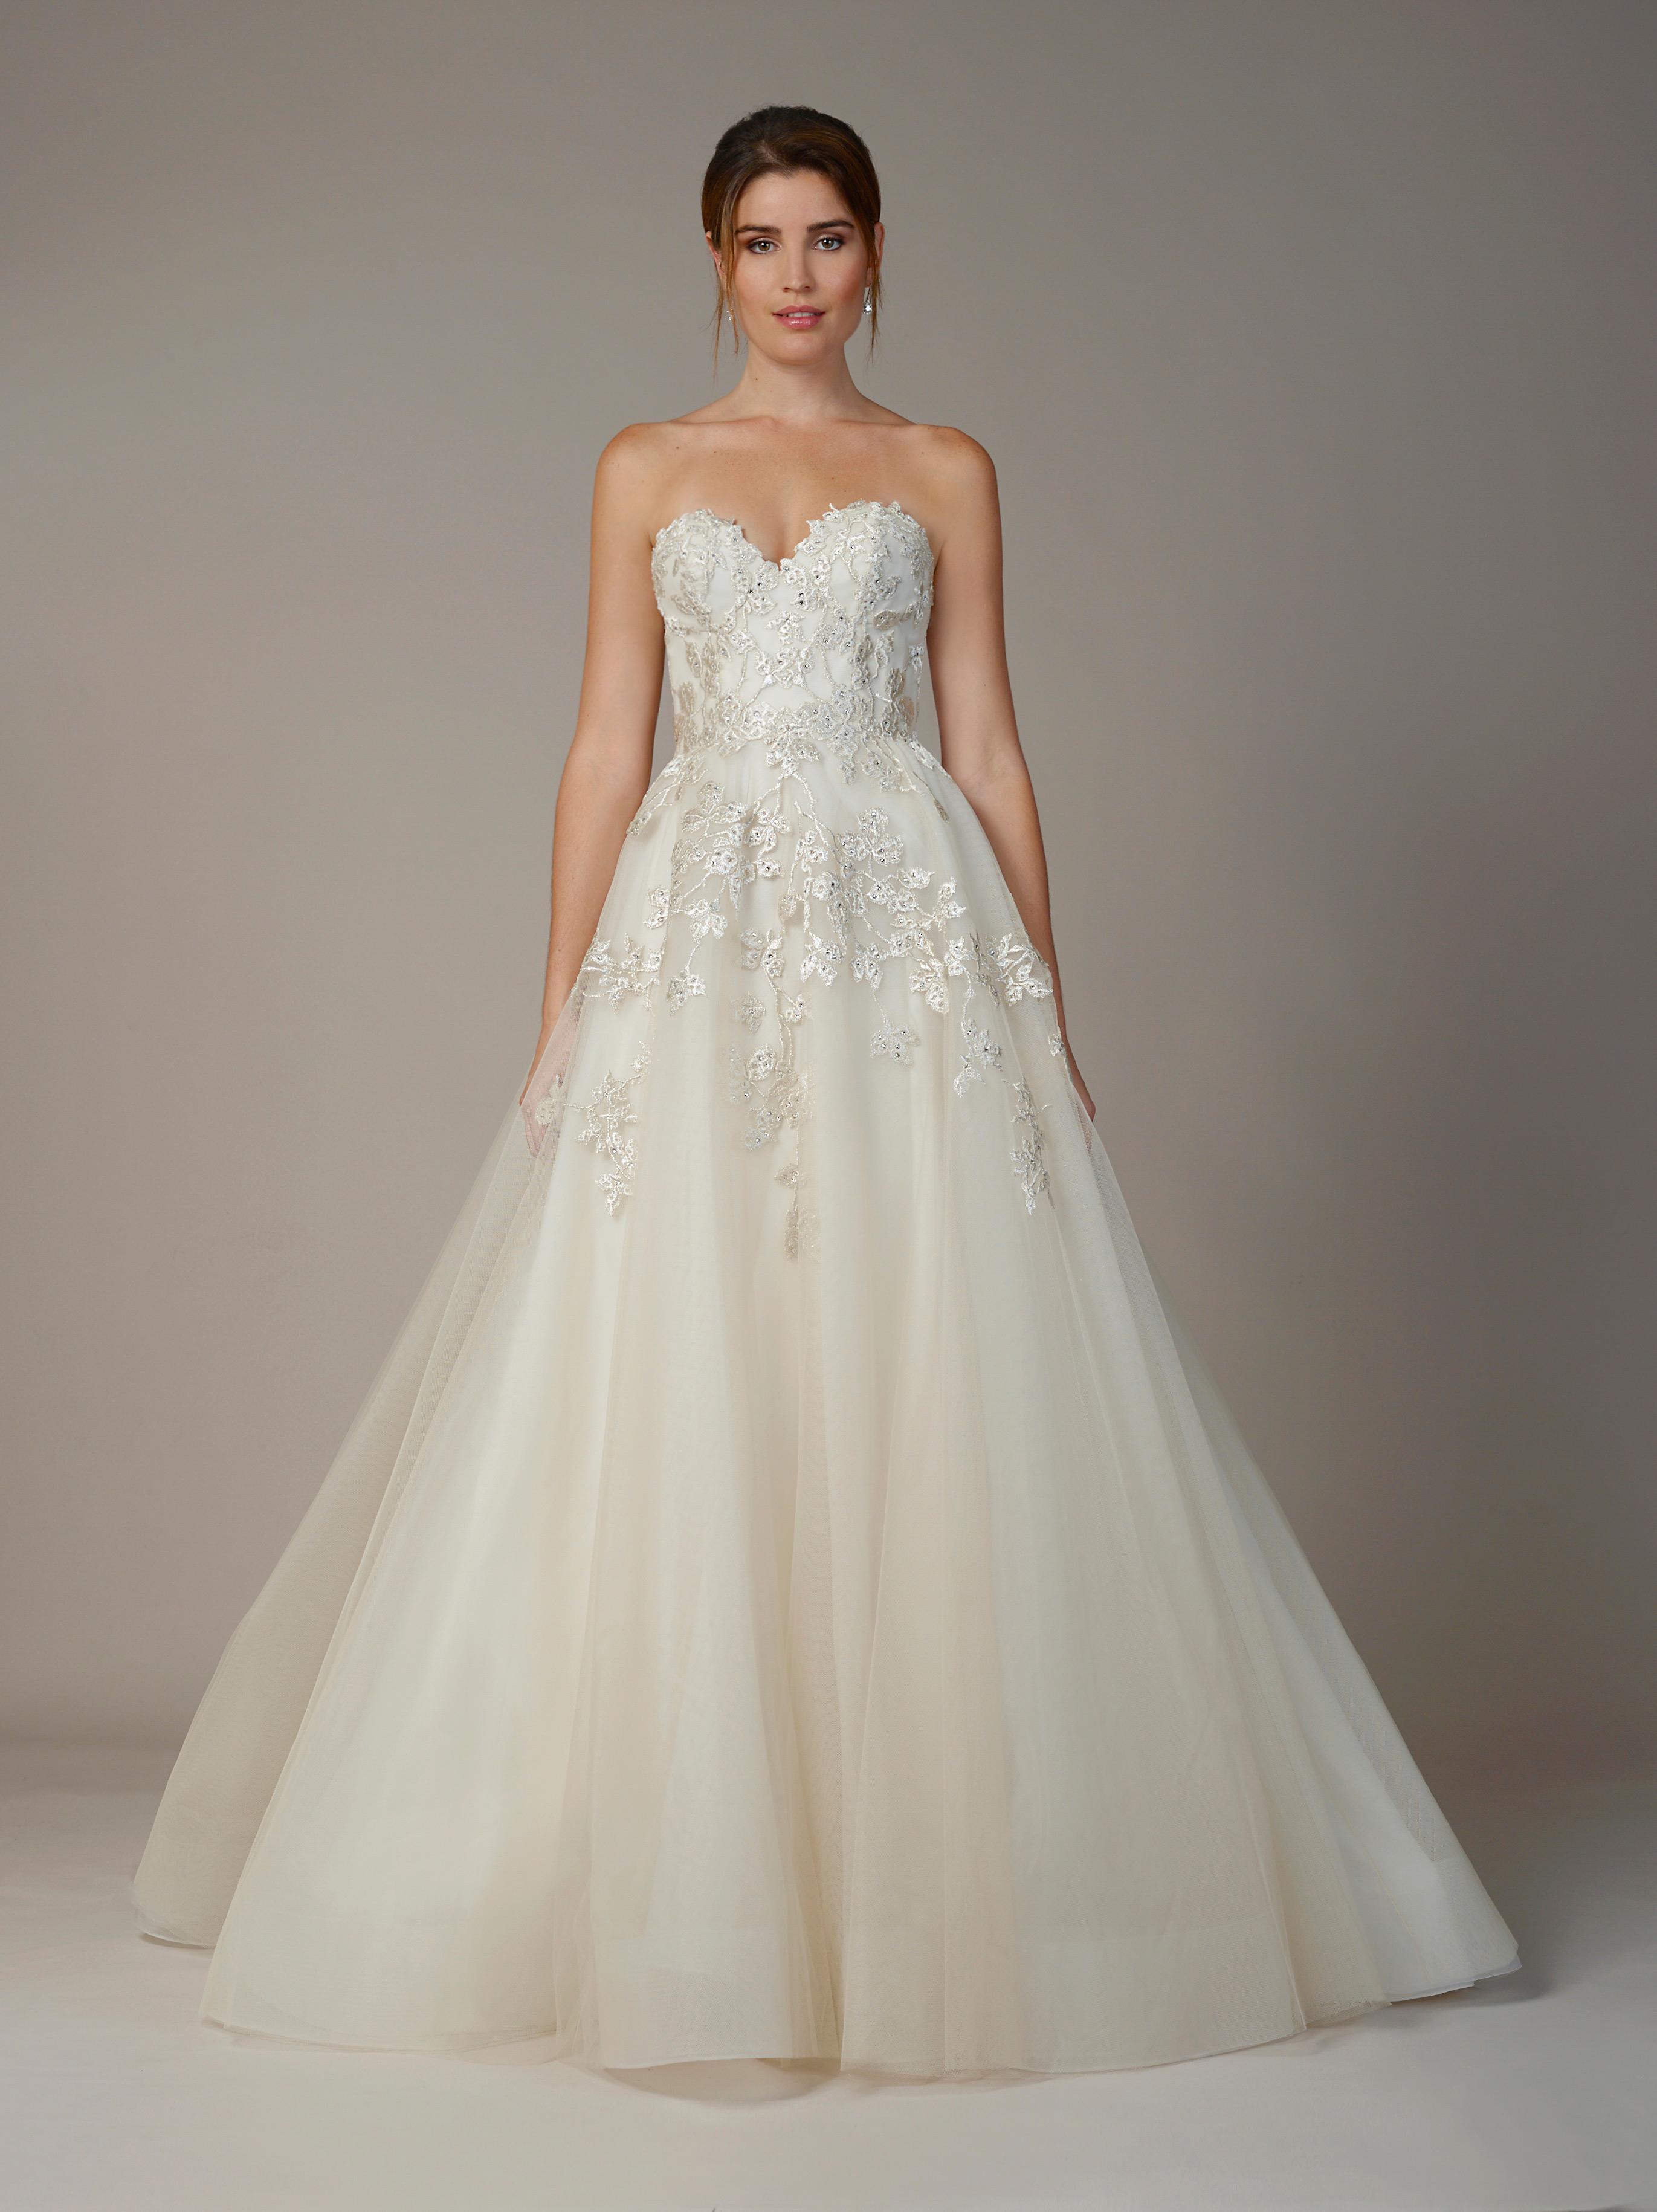 liancarlo wedding dress fall 2018 strapless sweetheart a-line